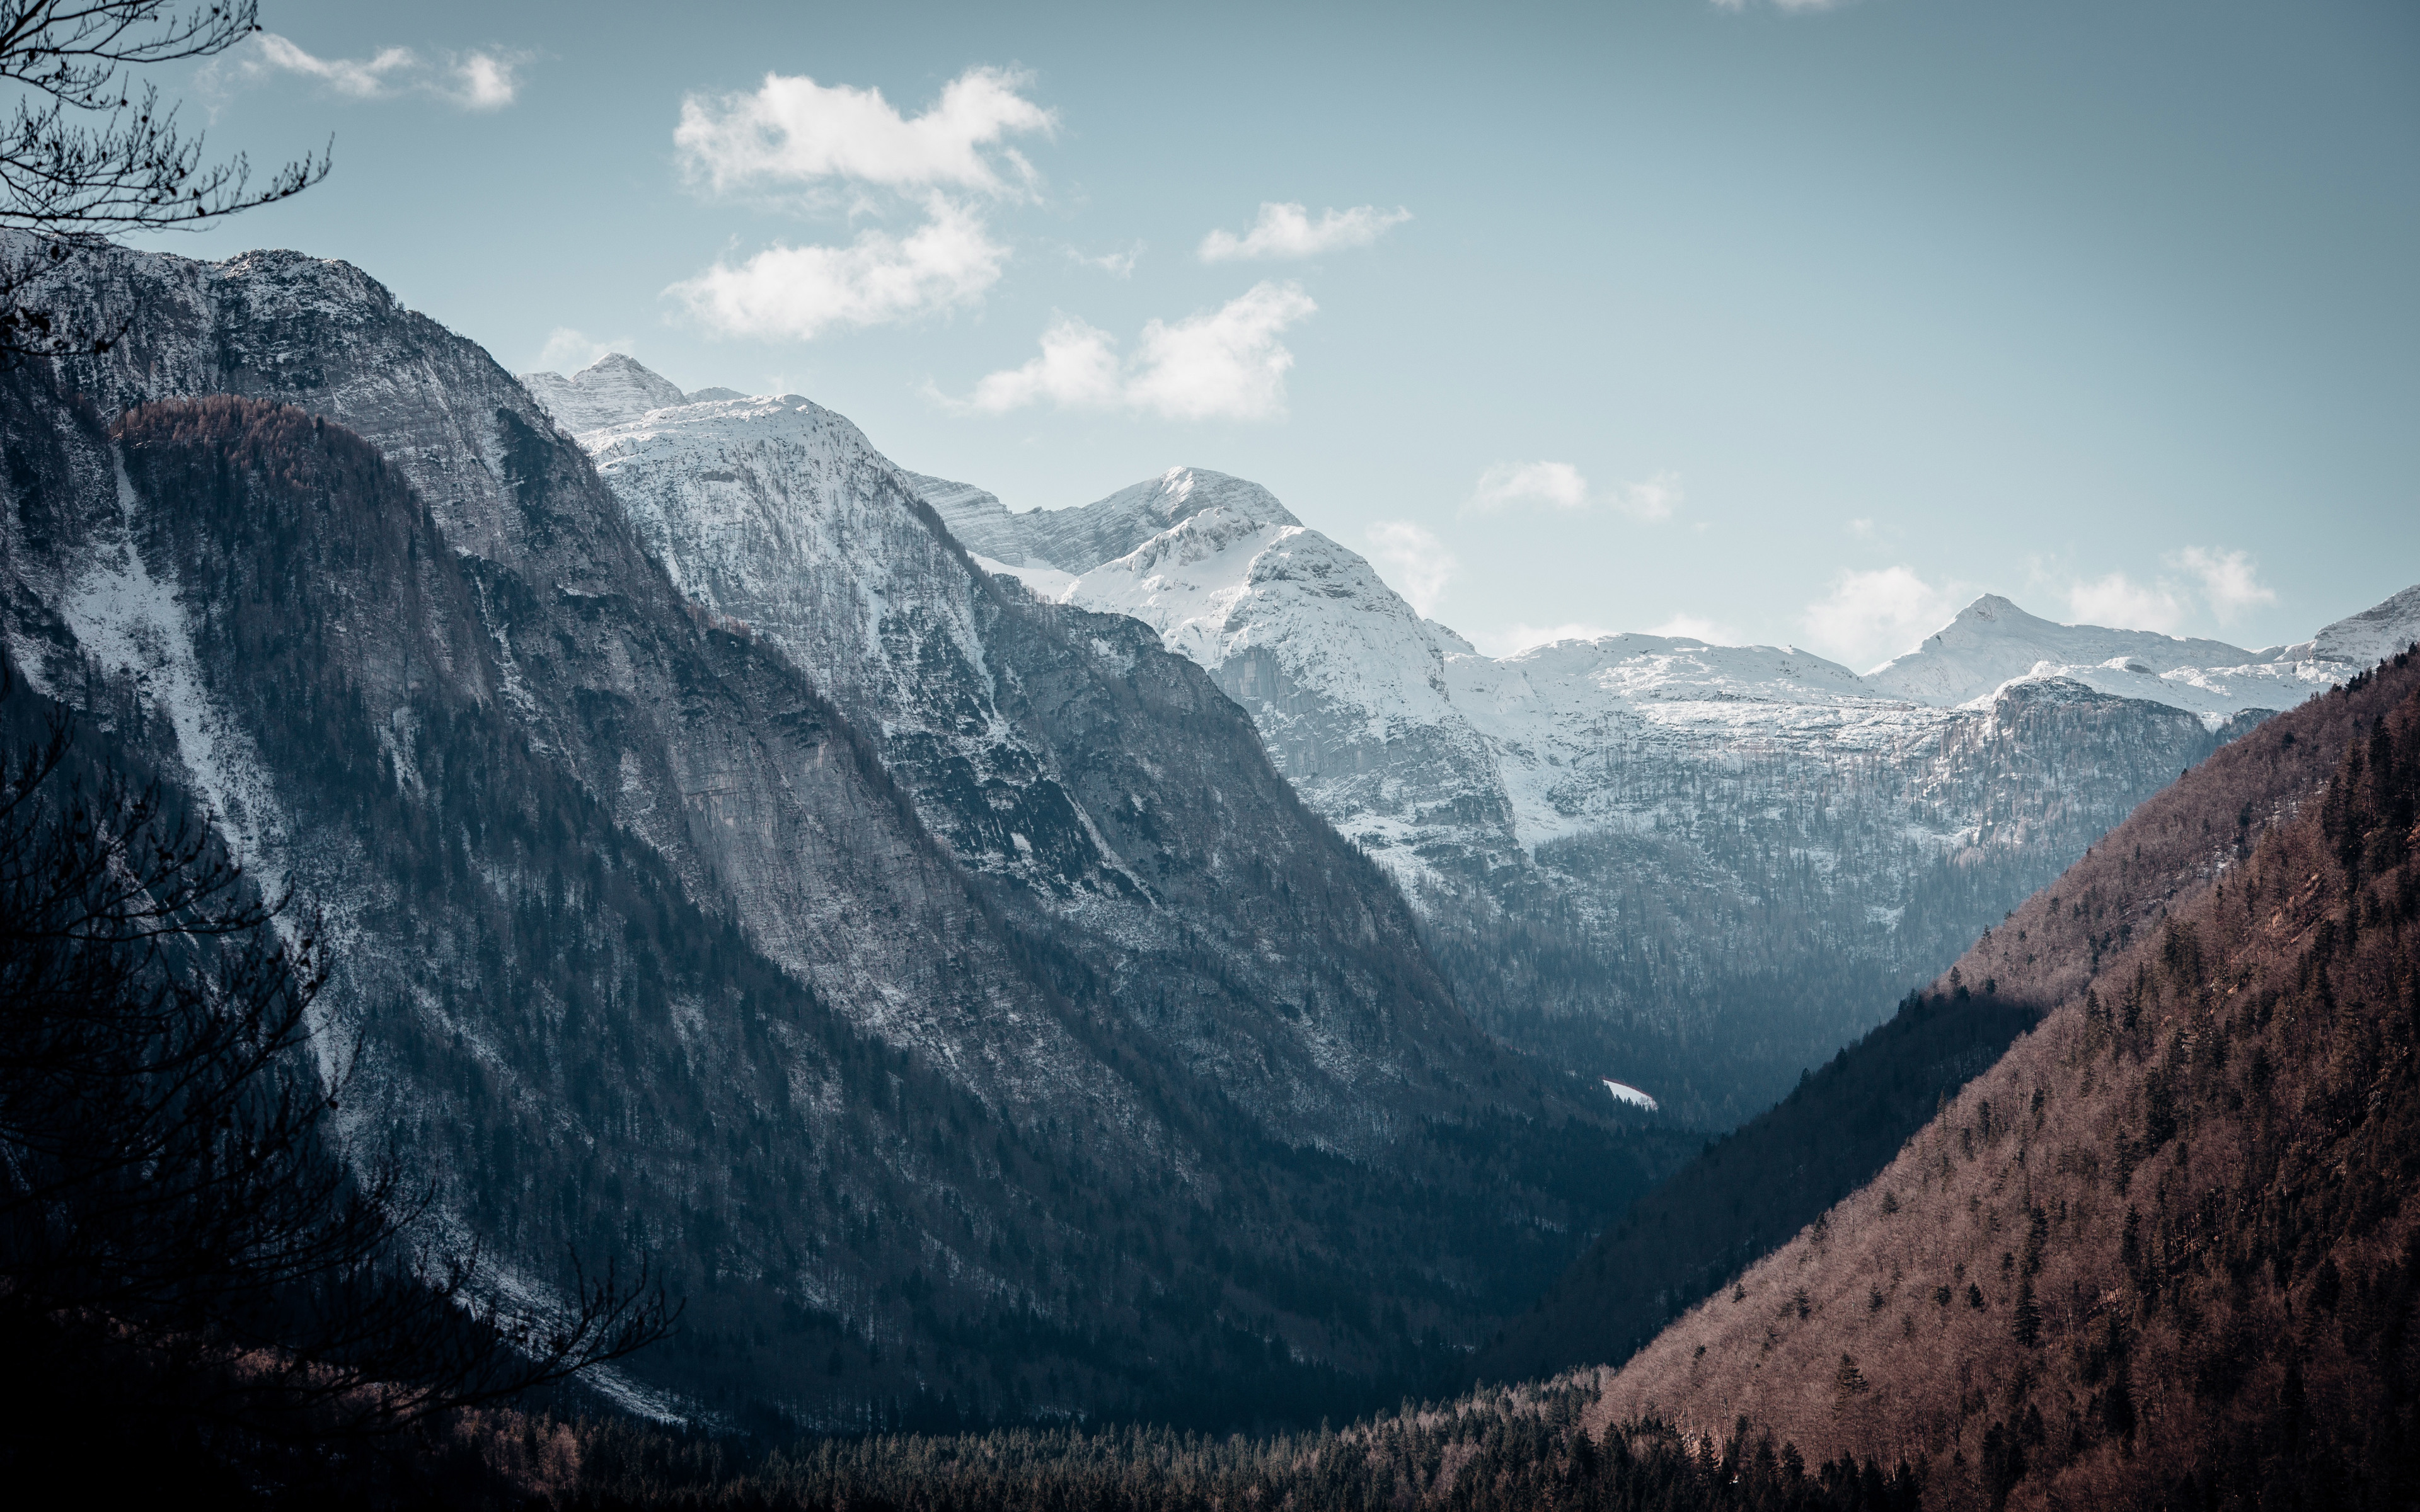 Beautiful Valley Landscape Mountains Hd 4k Wallpaper